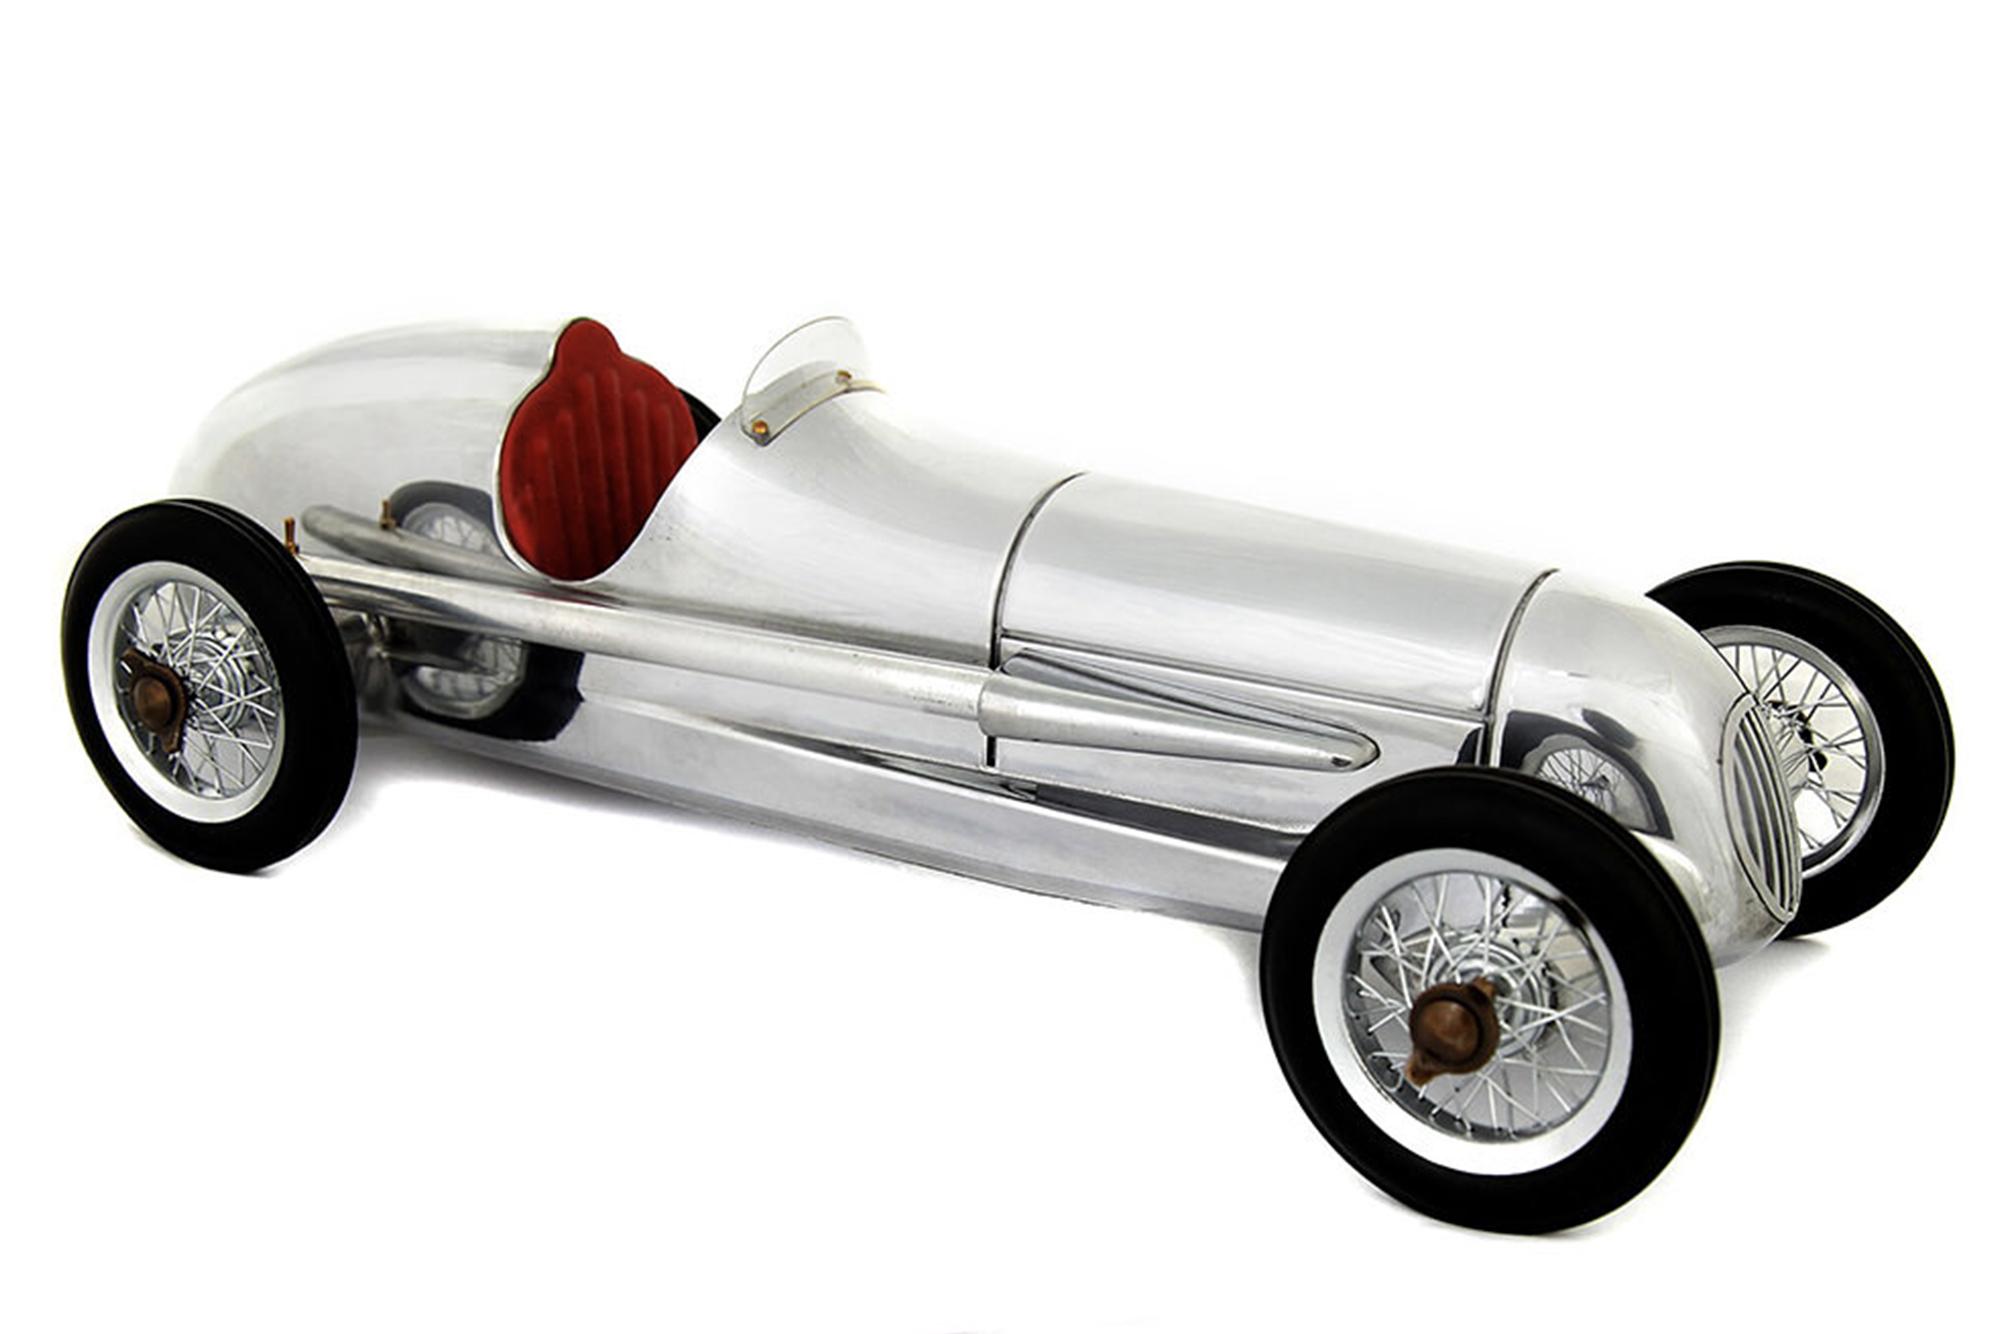 Silver desktop racer car model